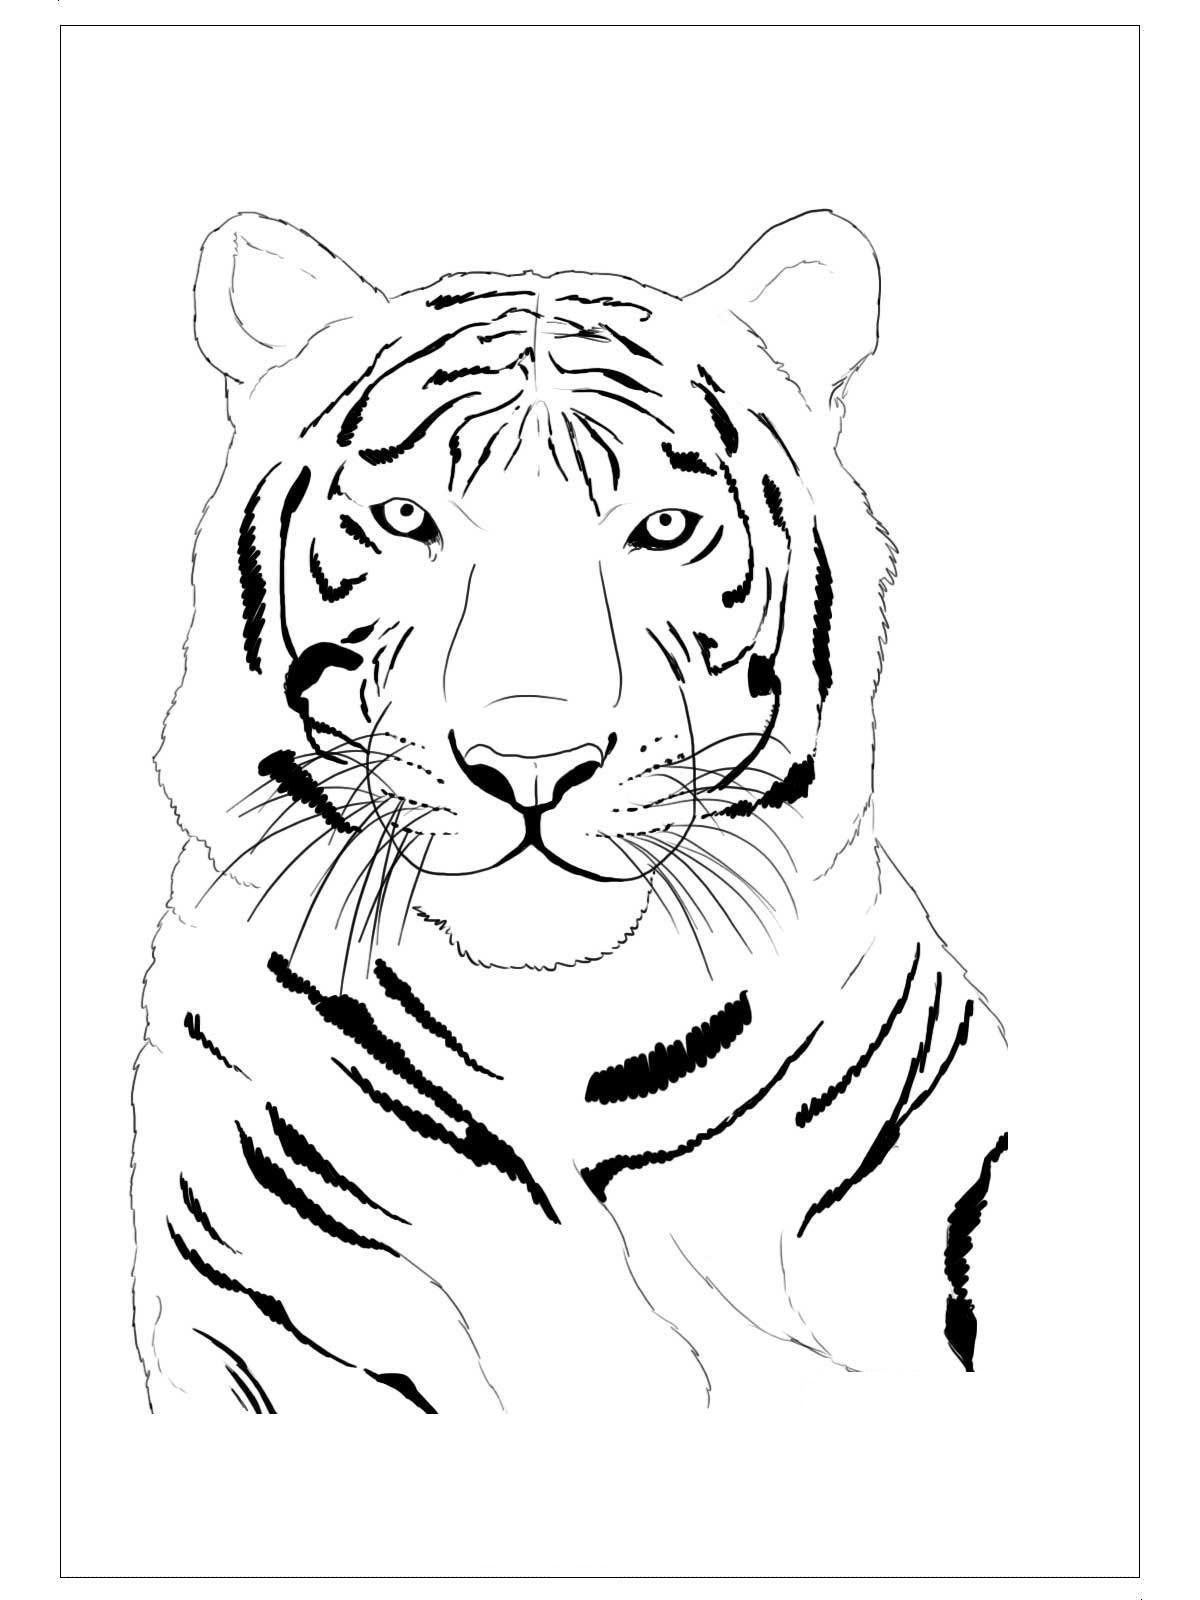 Tiger Coloring Page For Preschool